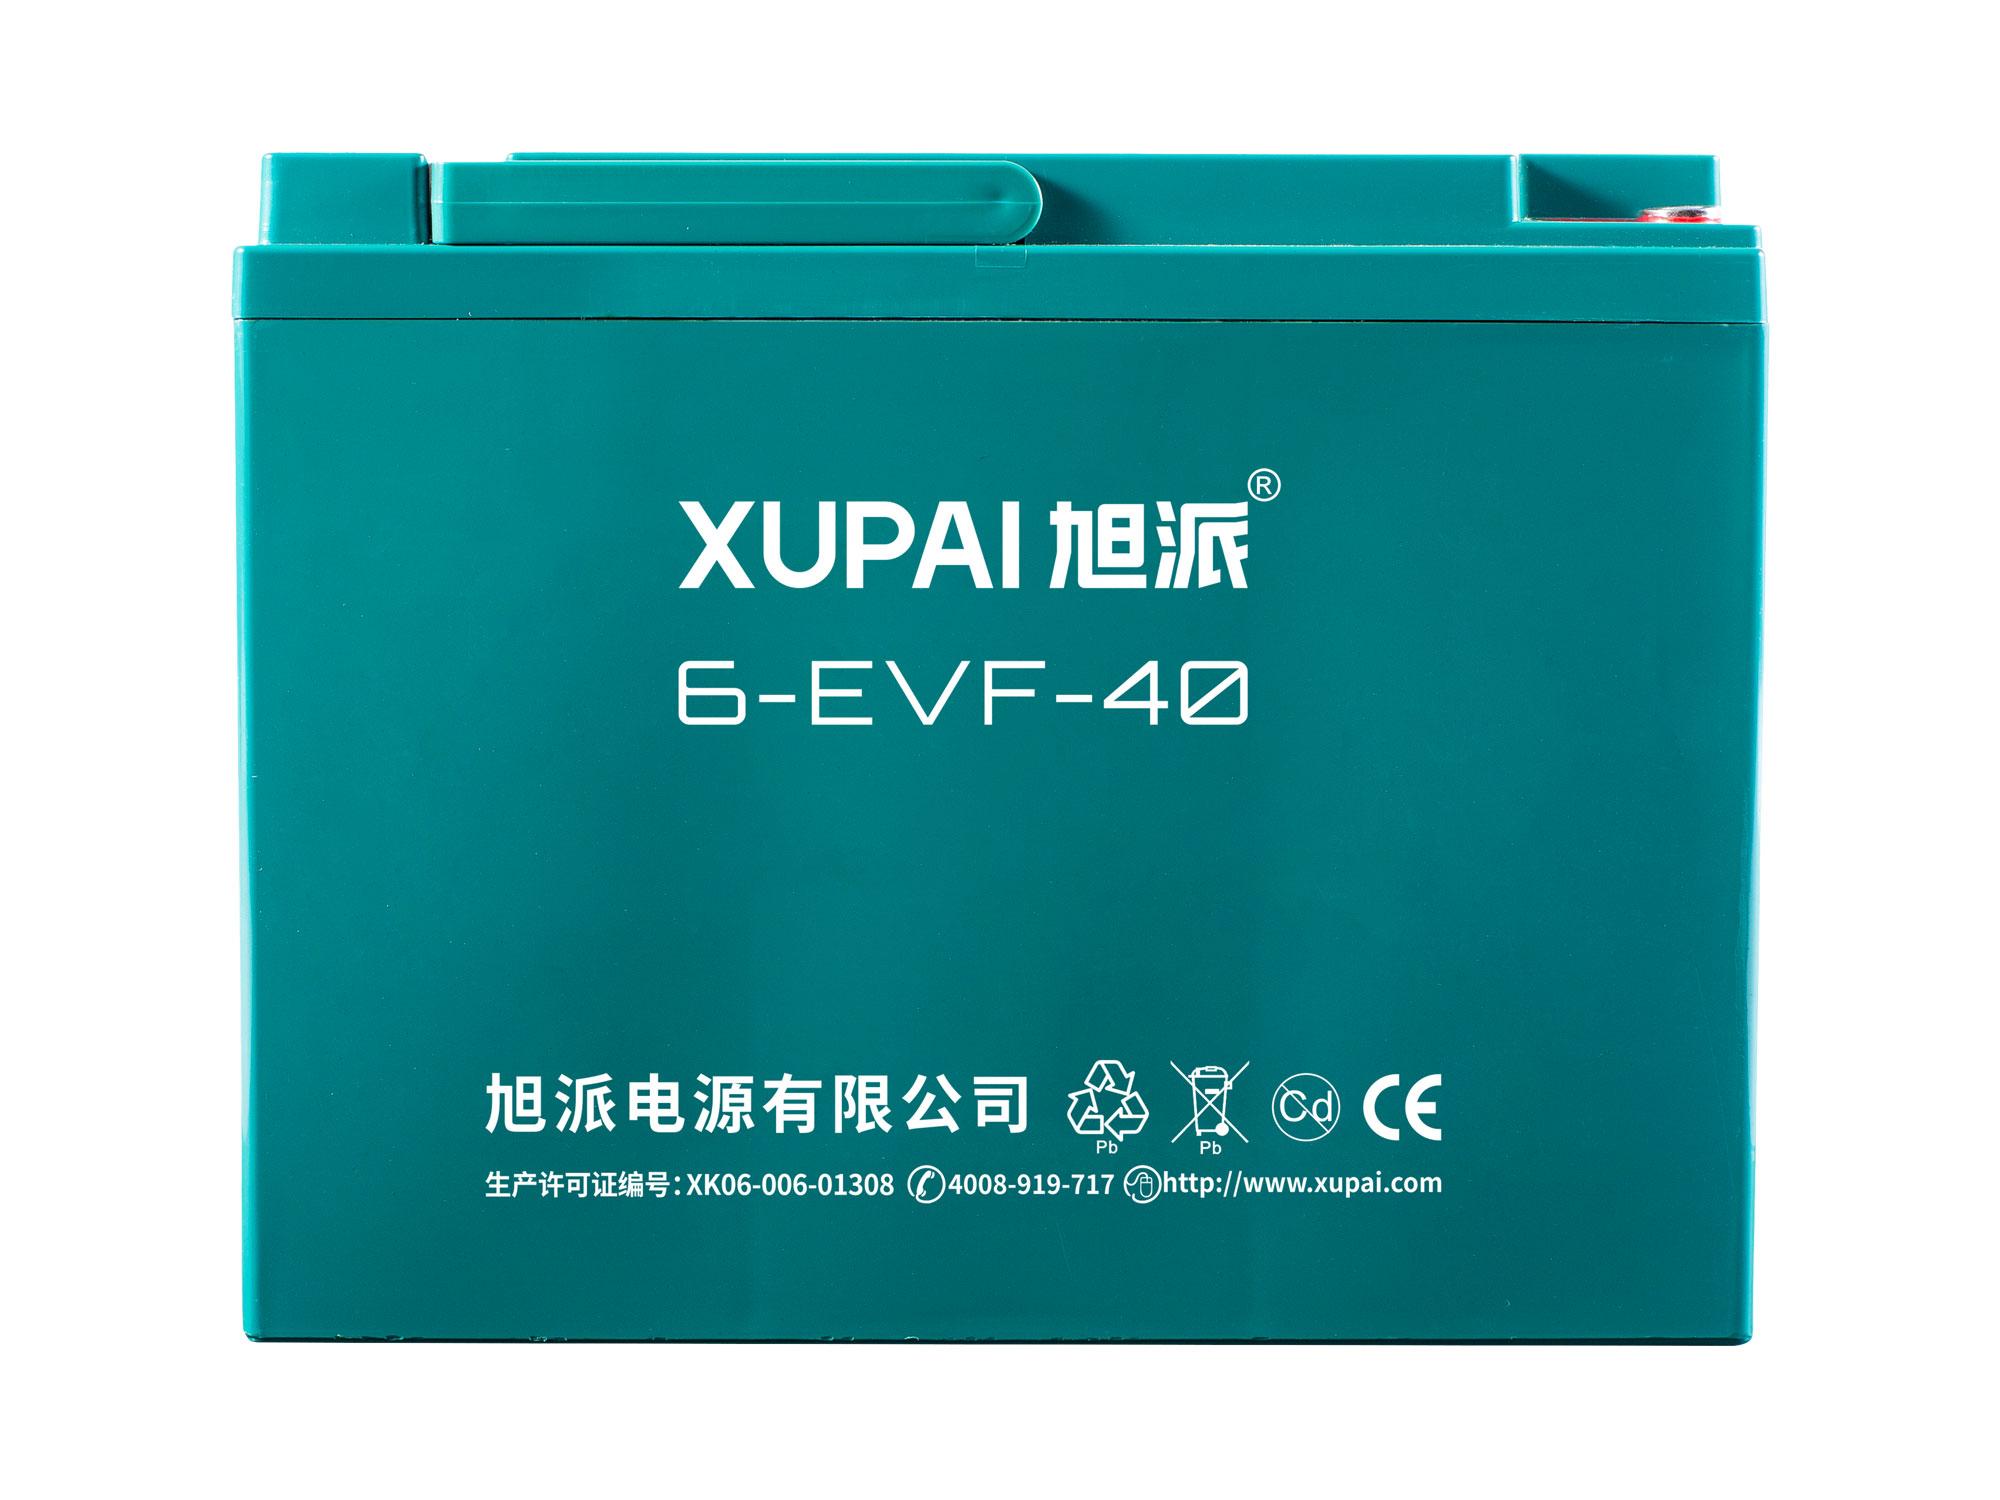 6-evf-40电动道路车电池